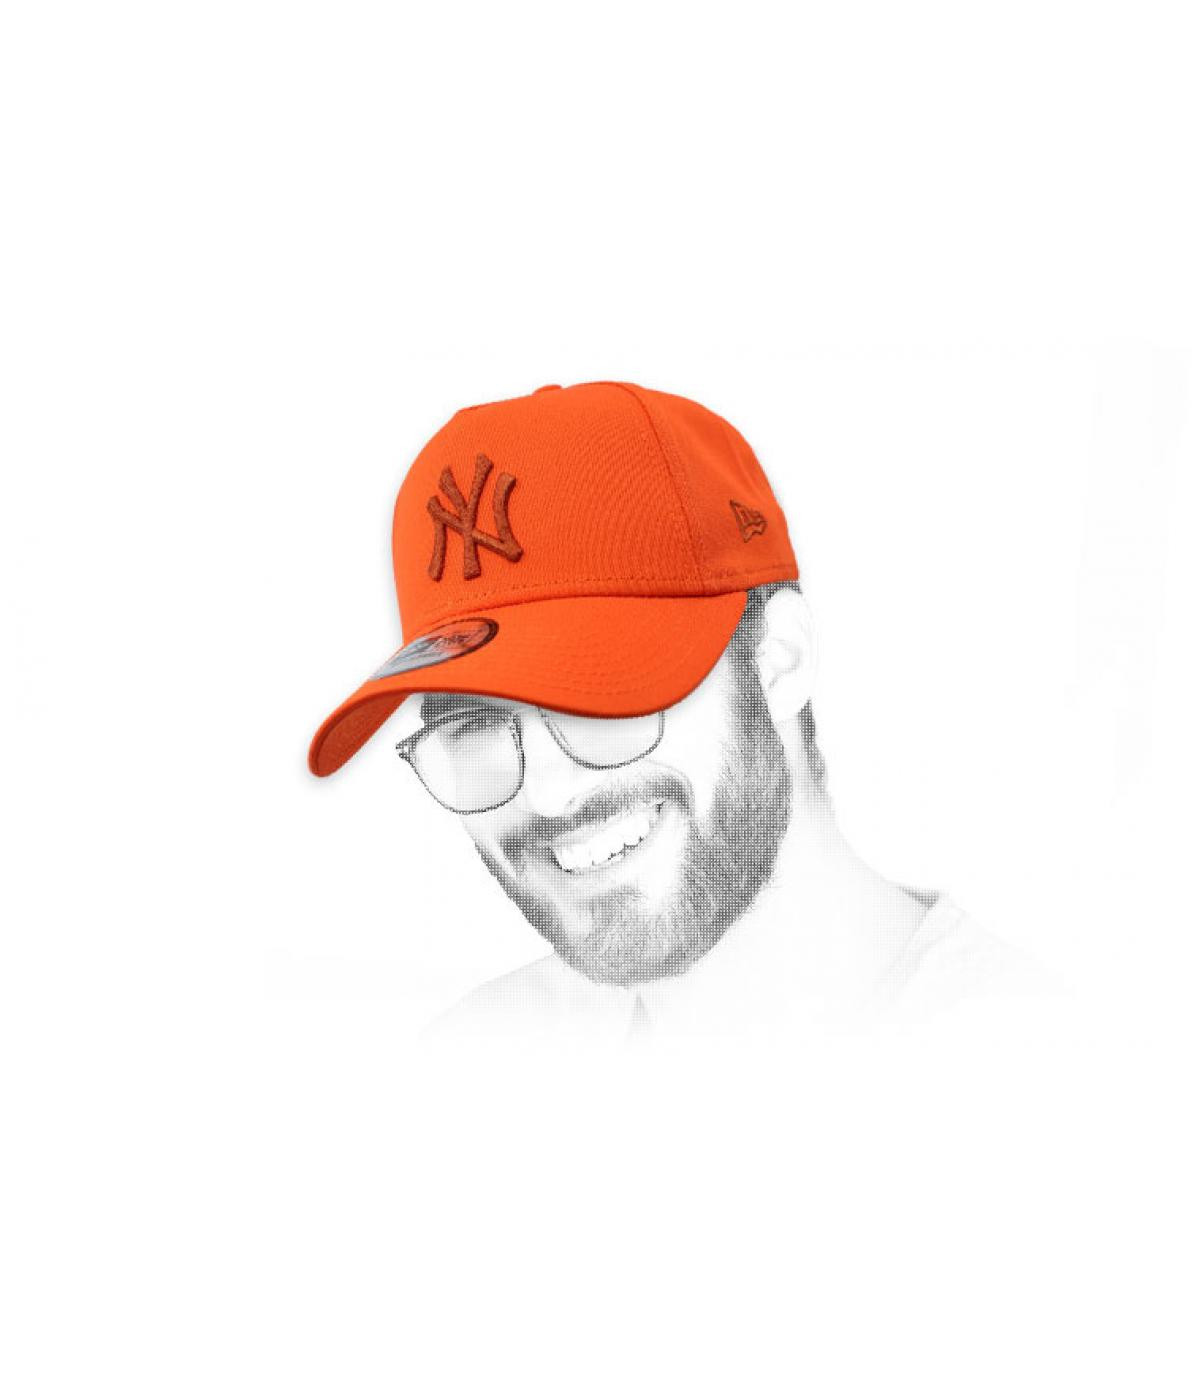 casquette NY orange Aframe